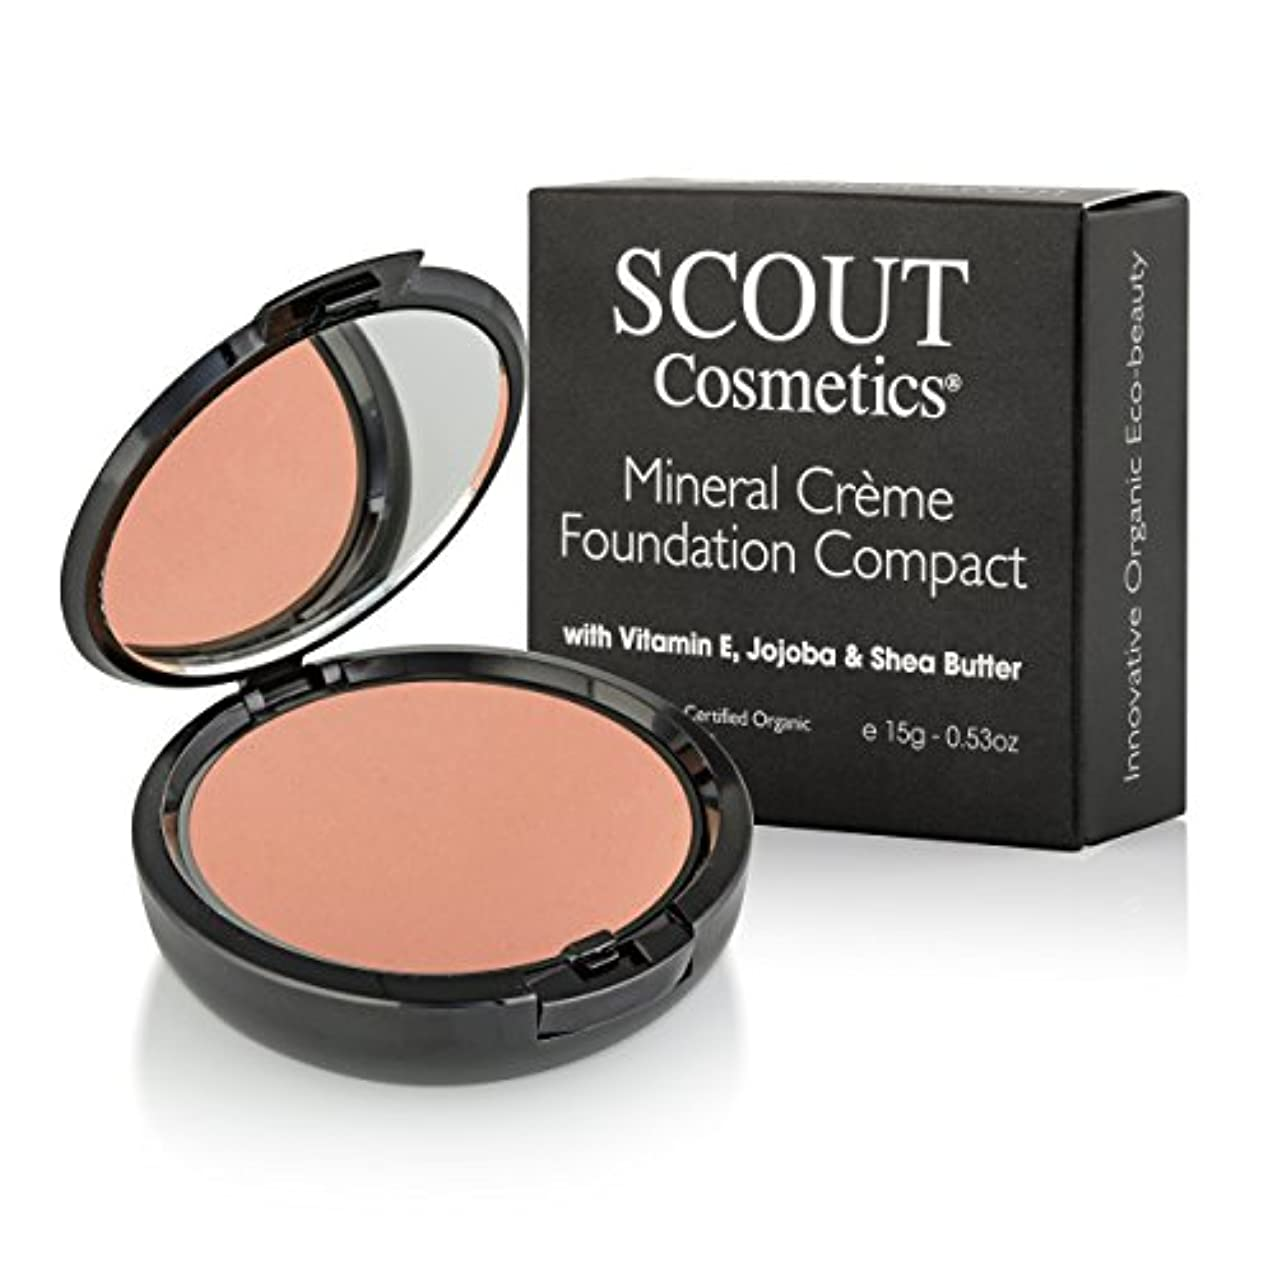 海洋帝国主義価値SCOUT Cosmetics Mineral Creme Foundation Compact SPF 15 - # Caramel 15g/0.53oz並行輸入品